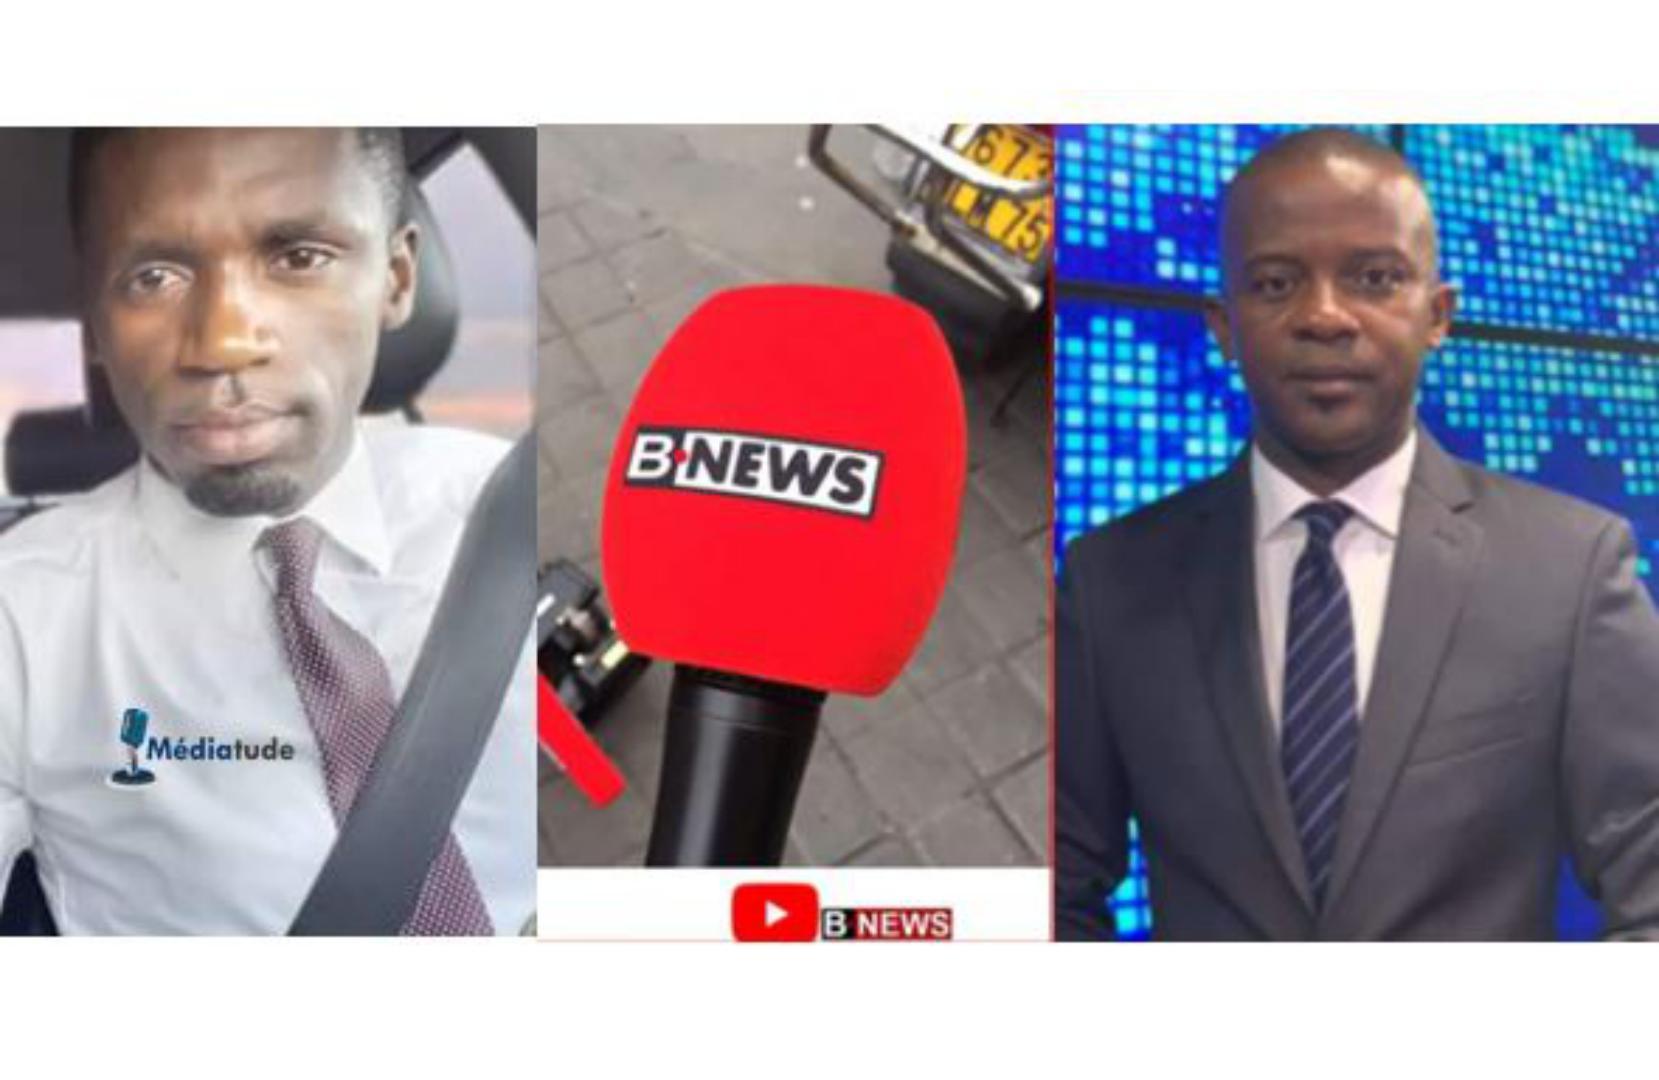 Projet BNews 1 : Bruno Bidjang affirme avoir été plagié